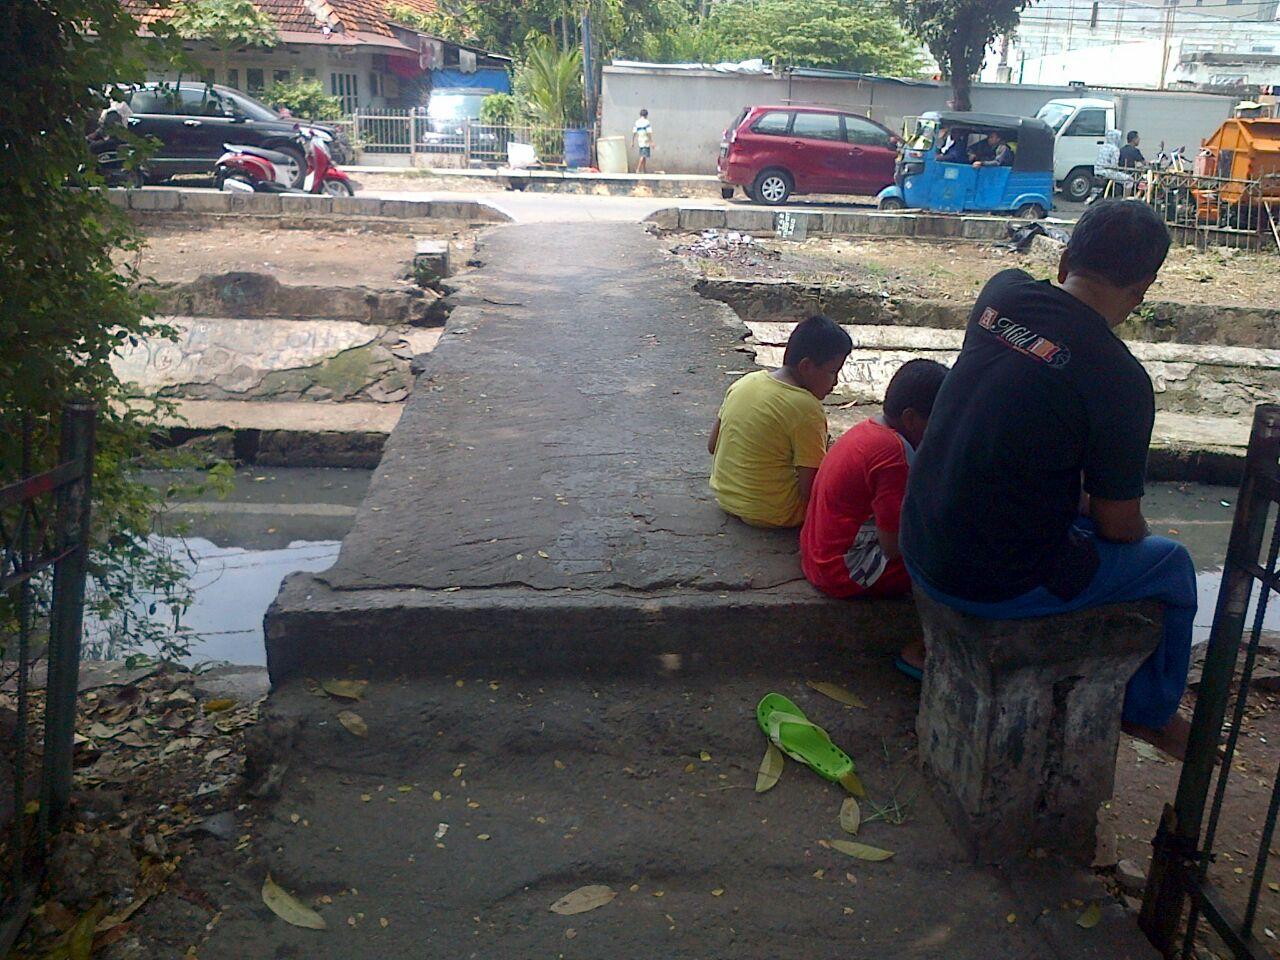 Sering Digunakan Untuk Lintasan Tawuran, Jembatan Penyebrangan Orang di Kalibaru Minta Dirobohkan